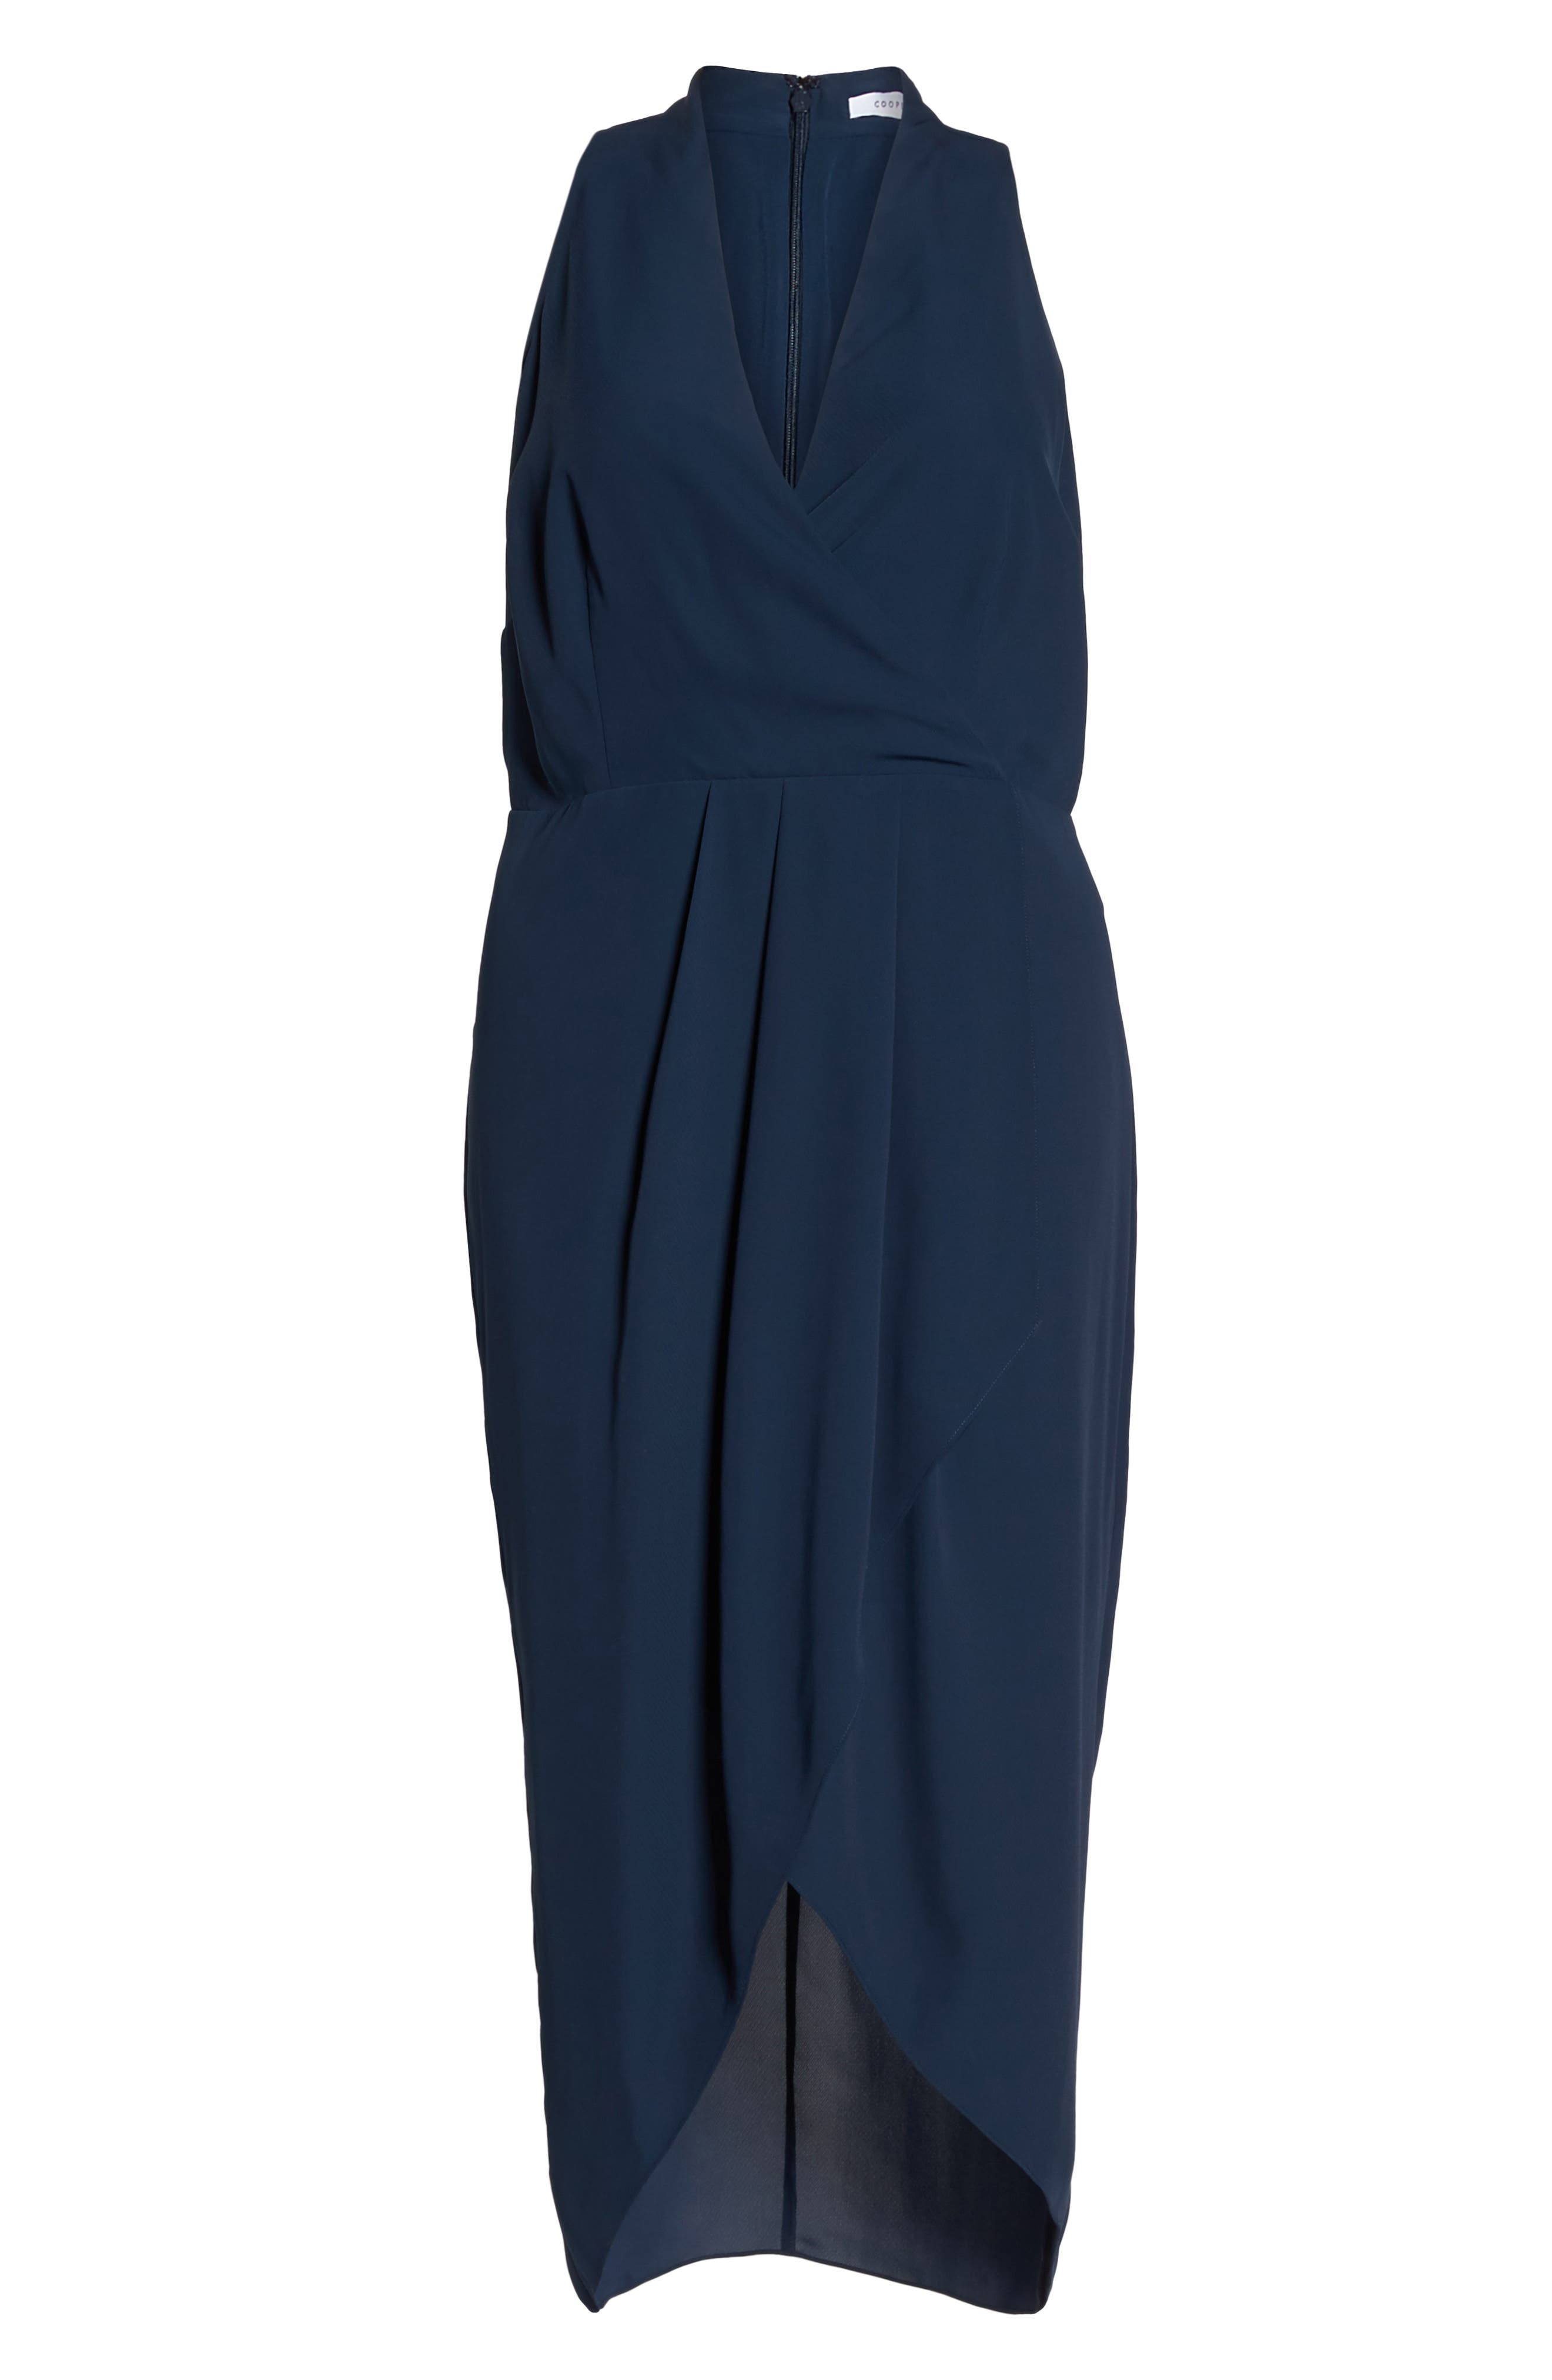 Evening Light Drape Dress,                             Alternate thumbnail 6, color,                             Iron Navy